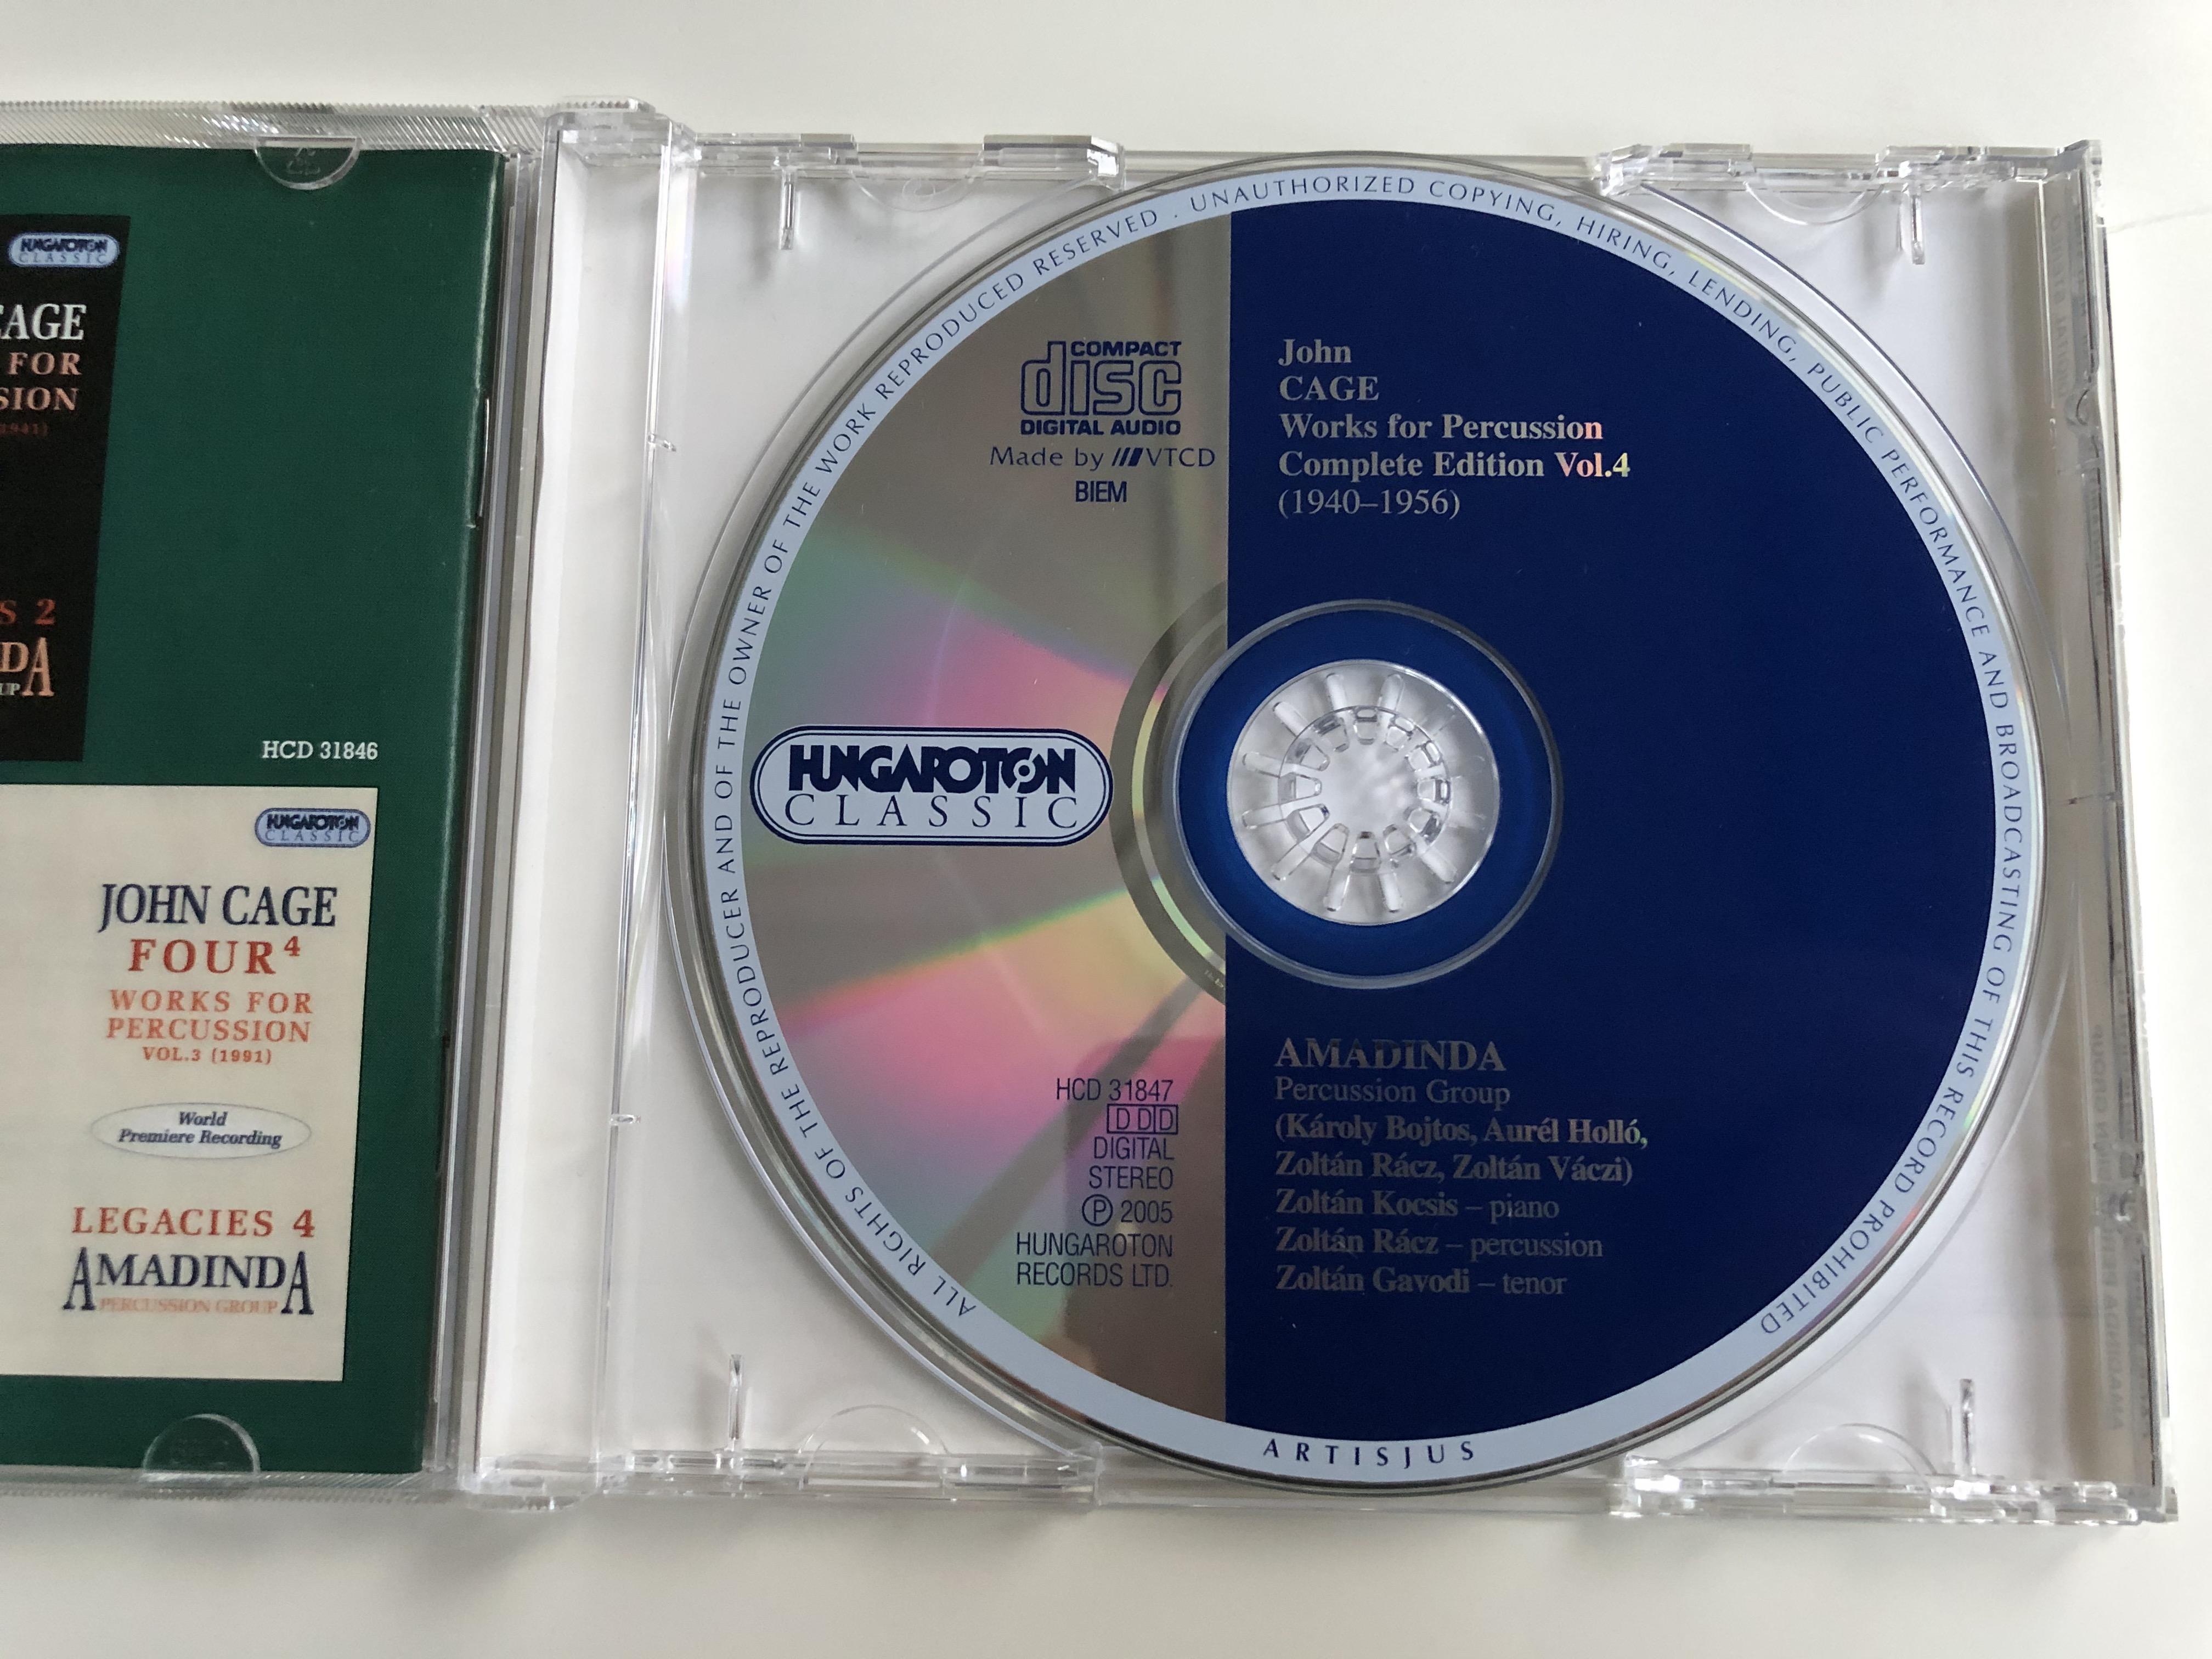 john-cage-works-for-percussion-vol.4-1940-1956-legacies-6-amadinda-percussion-group-zolt-n-kocsis-zolt-n-r-cz-zolt-n-gavodi-hungaroton-classic-audio-cd-2005-stereo-hcd-31847-6-.jpg